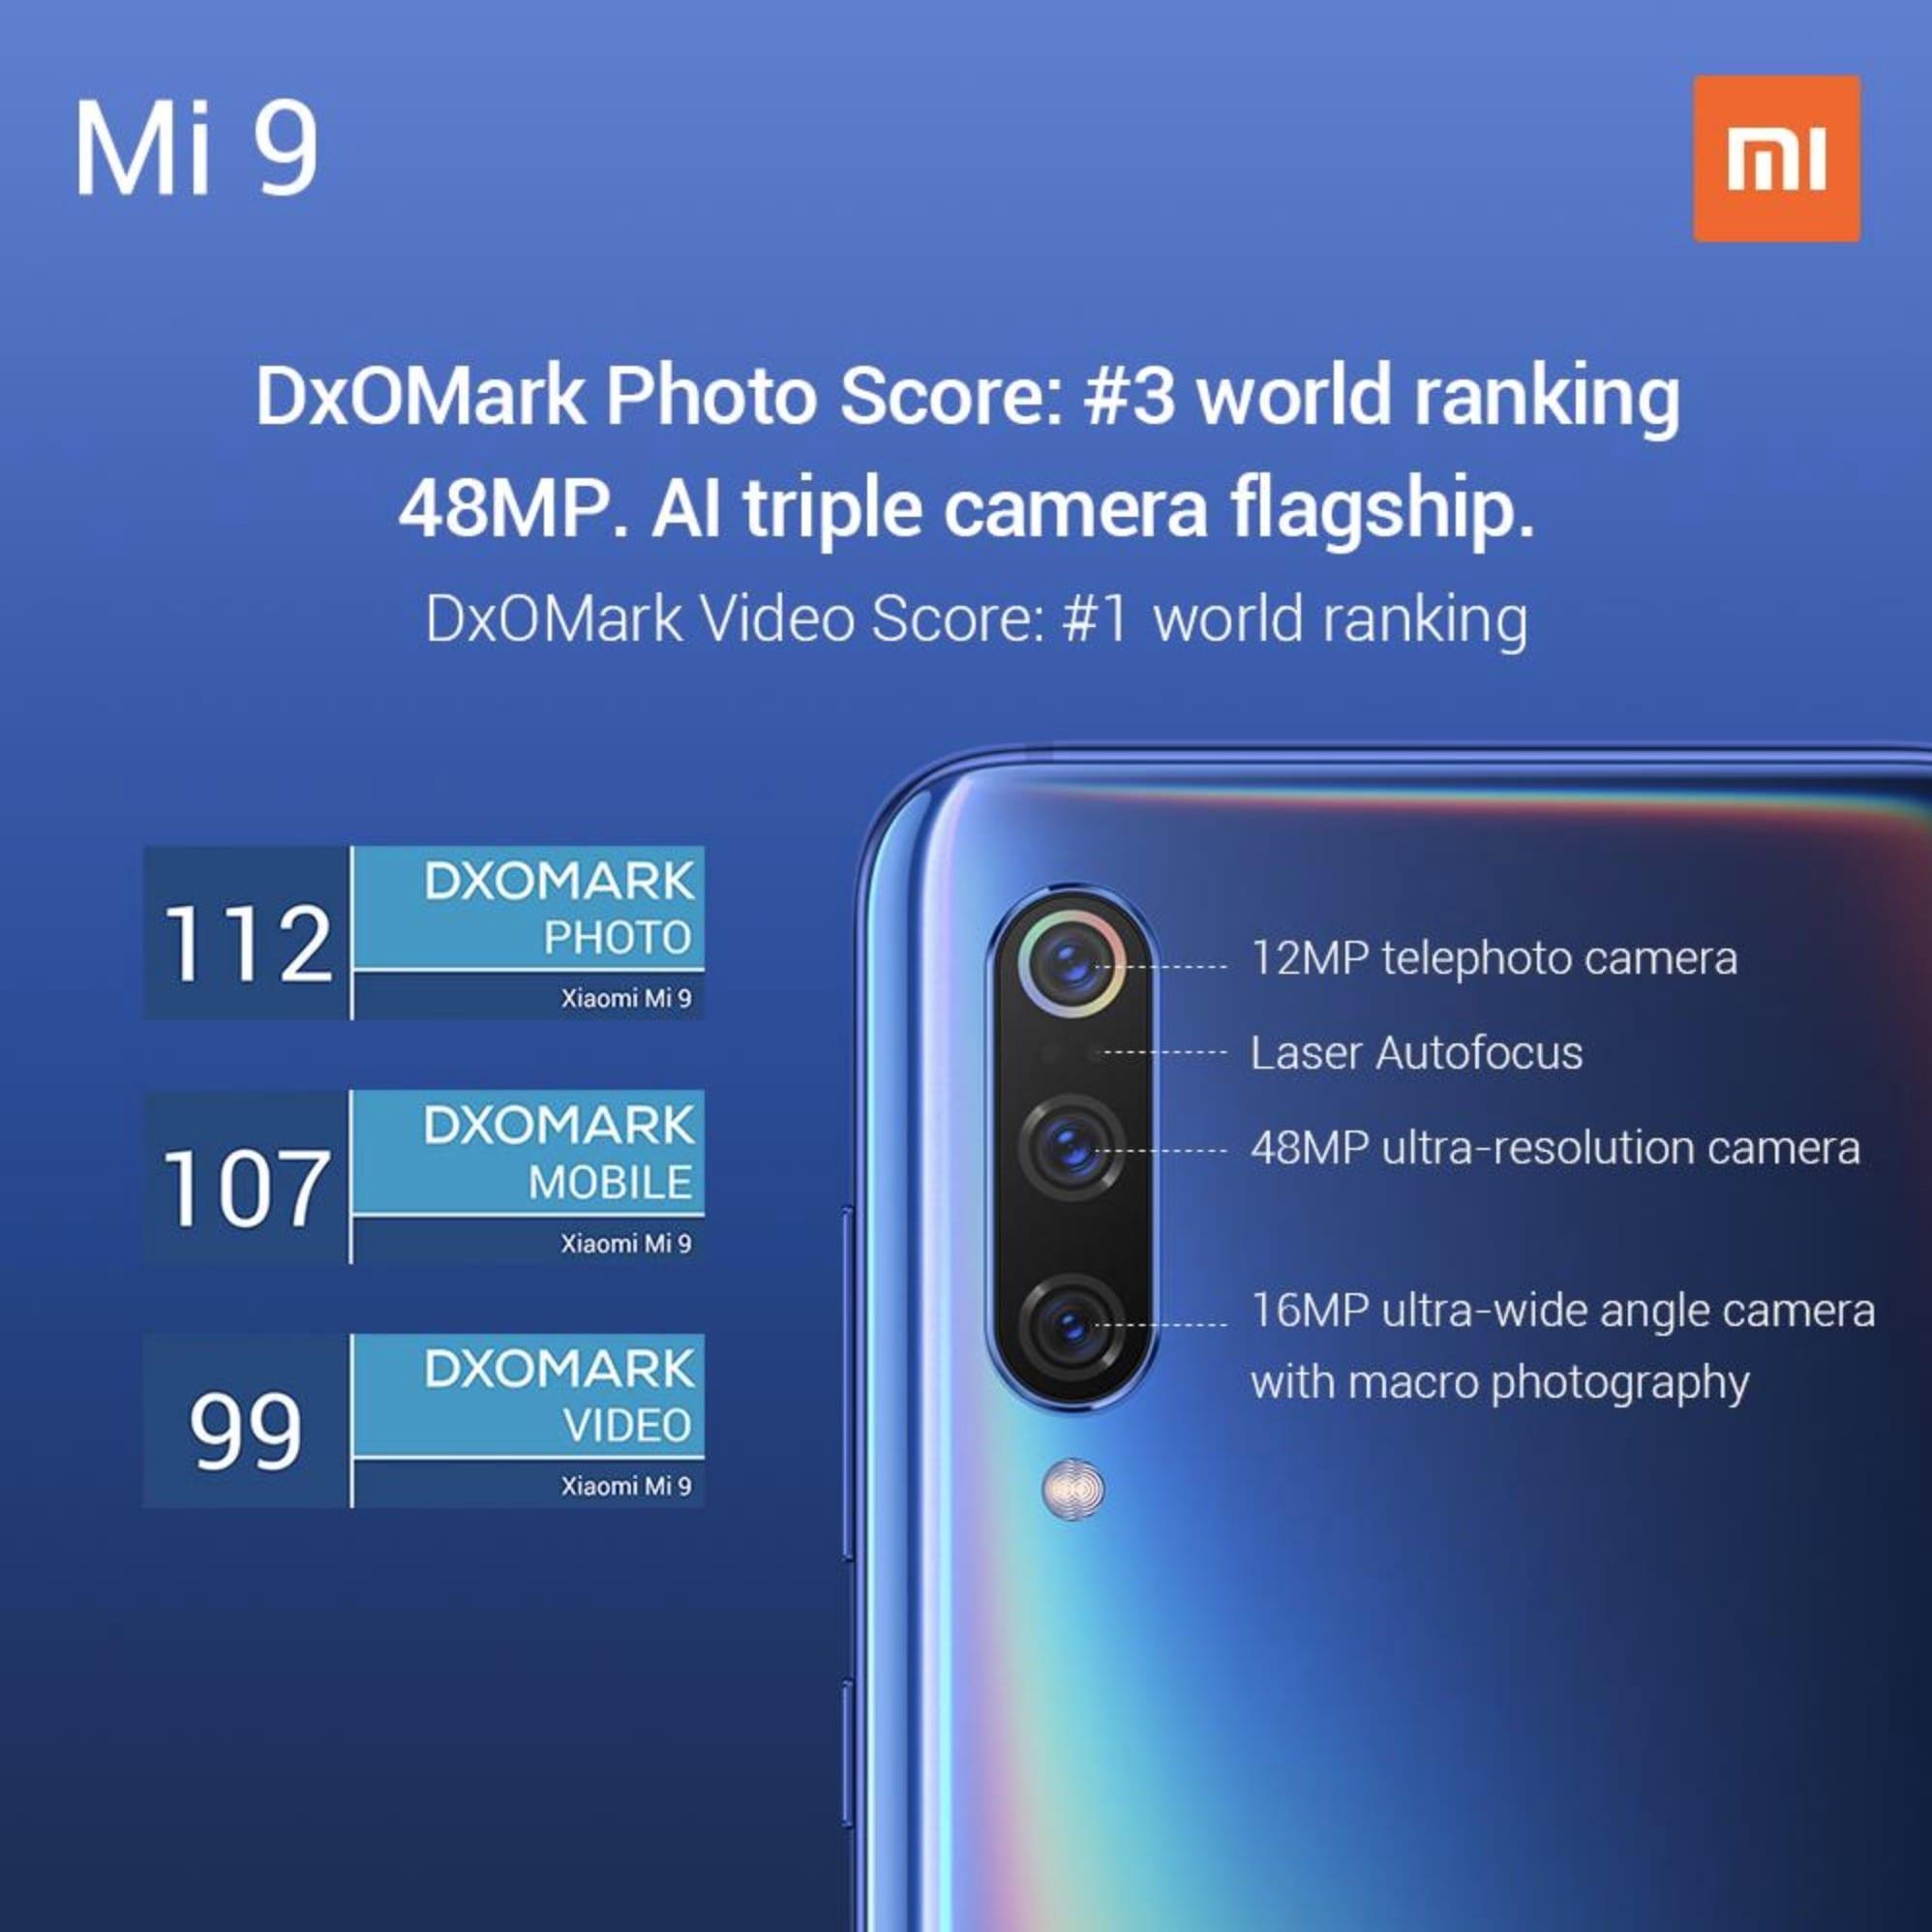 Mi 9 DxoMark score